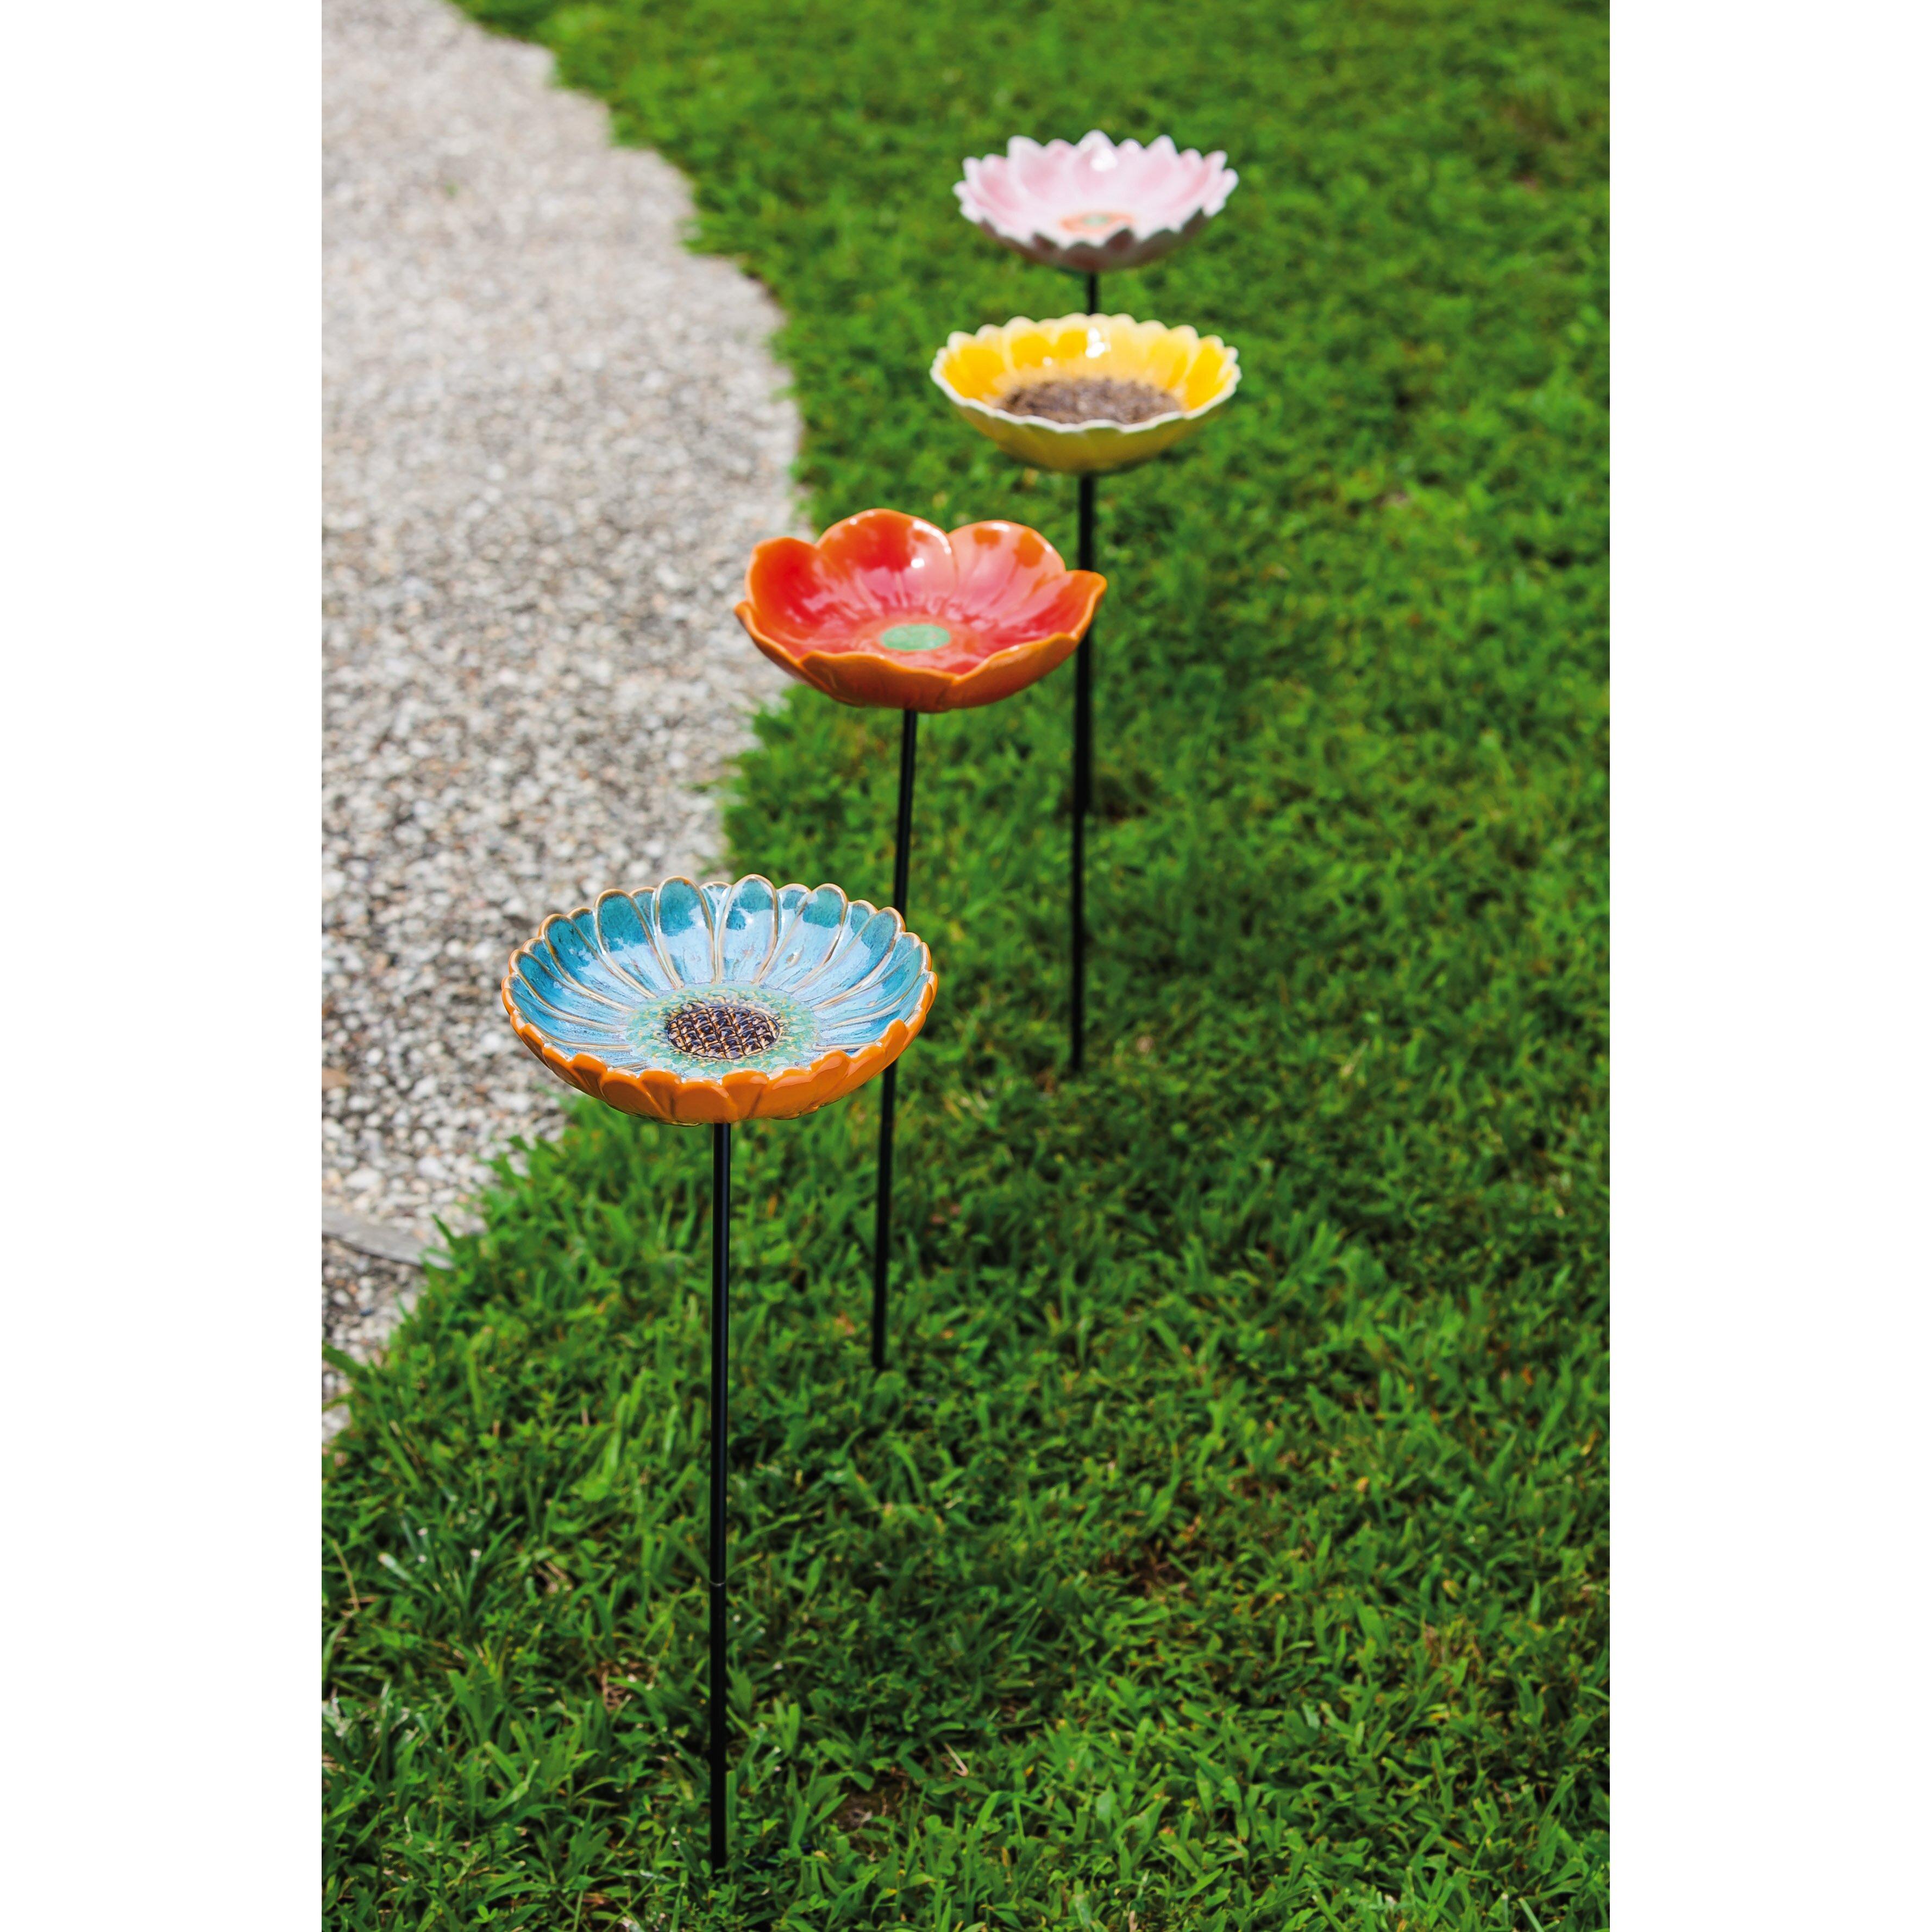 Better Homes And Gardens Outdoor Wicker Furniture 6 Piece Tesco